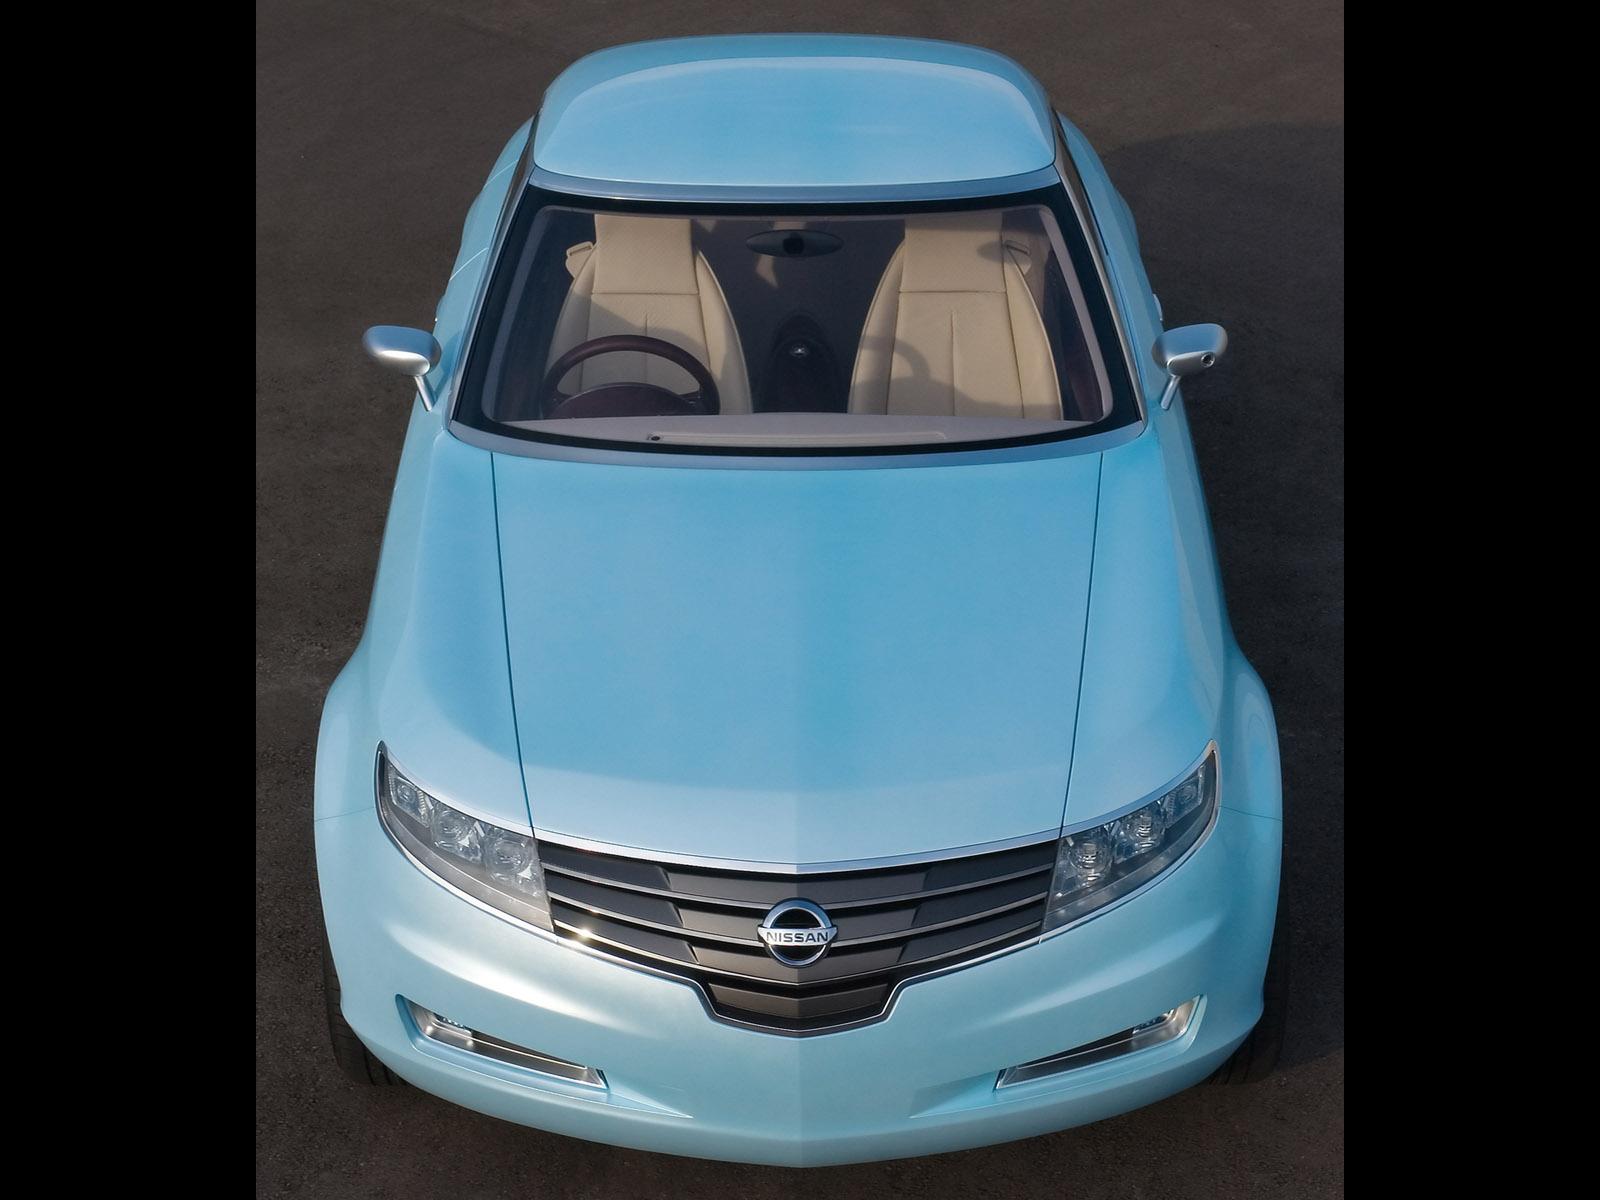 Nissan Foria photo 34501